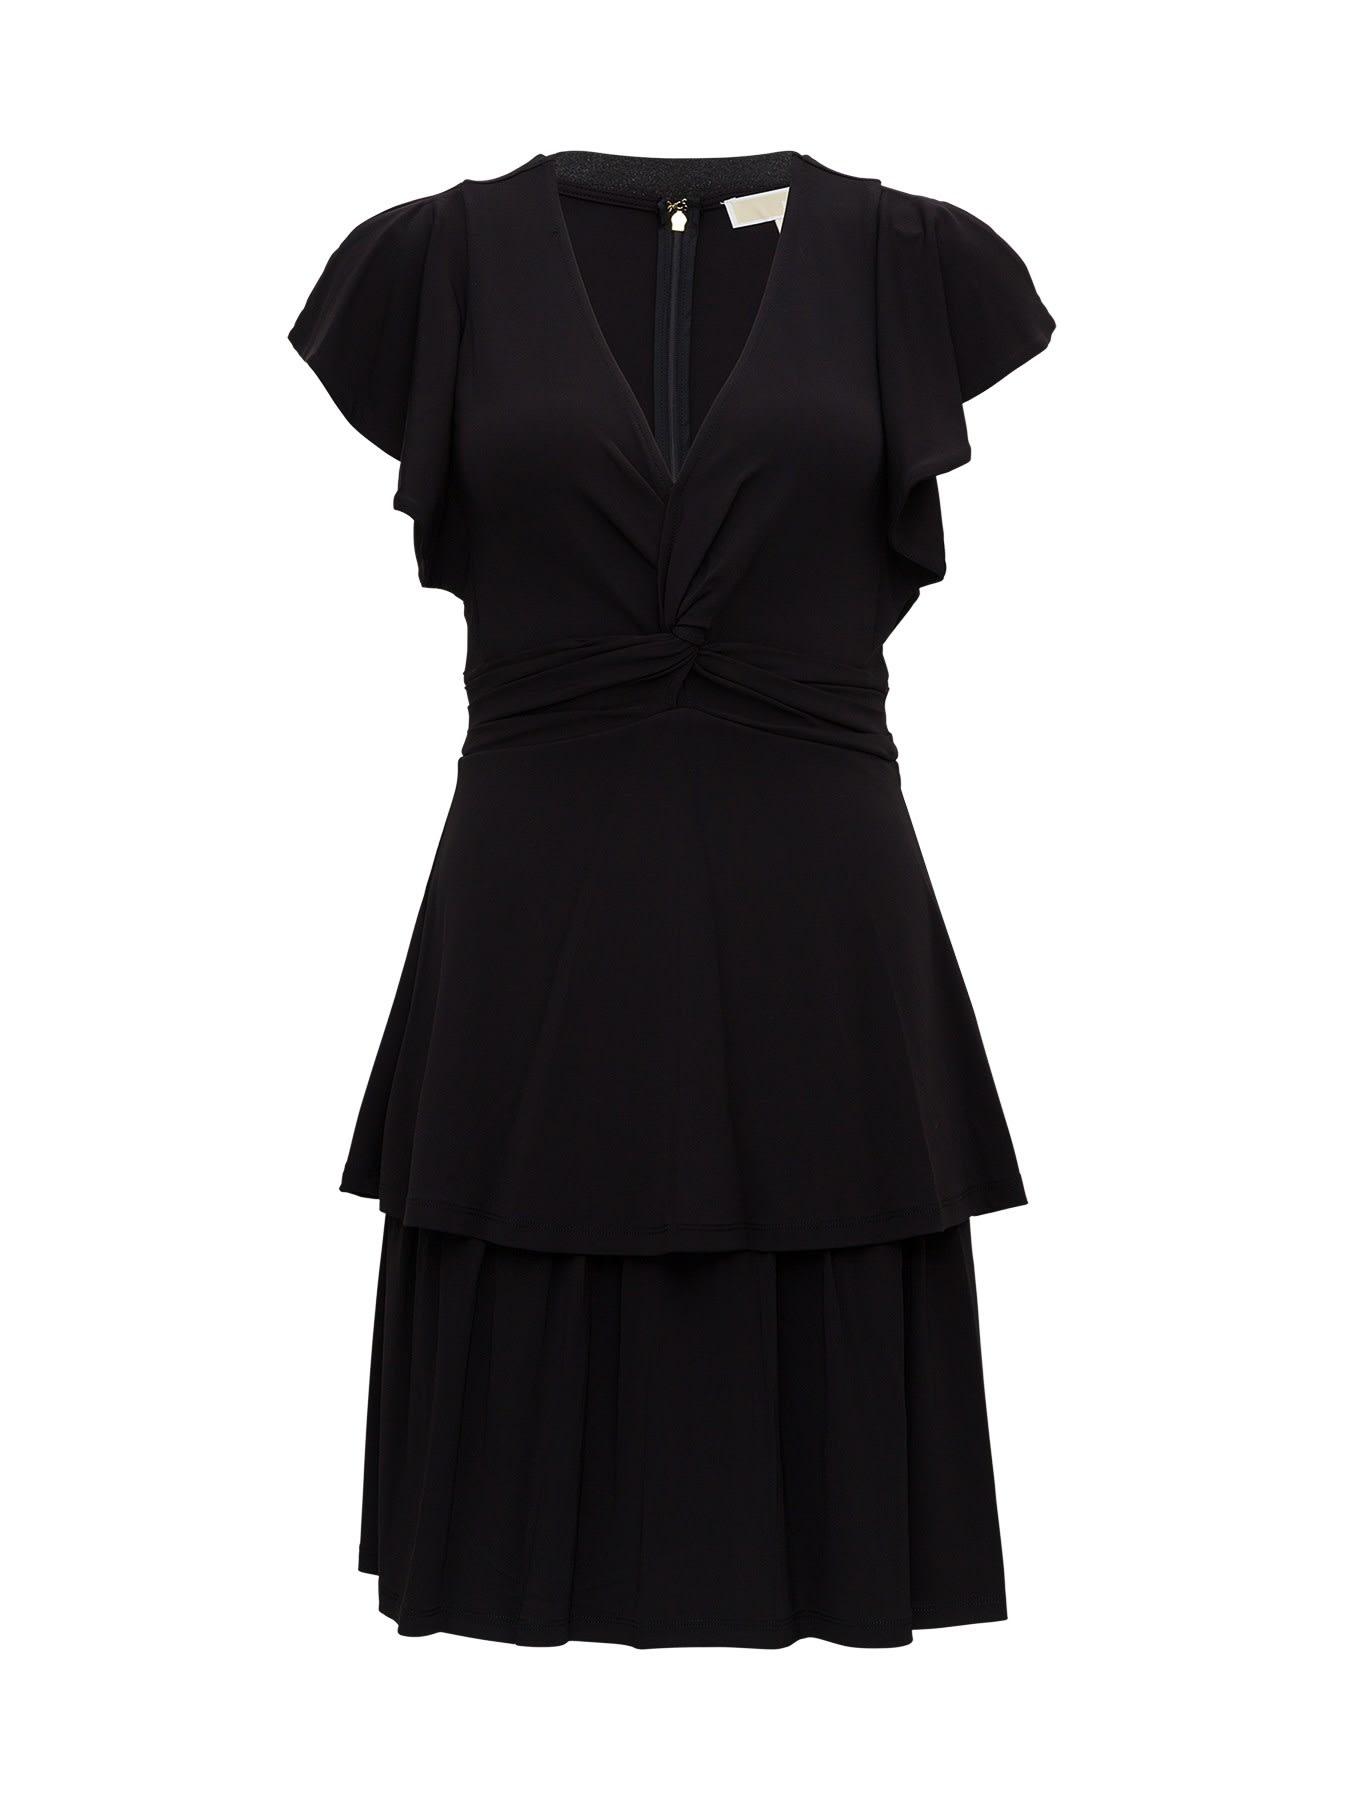 Michael Kors Frill Dress